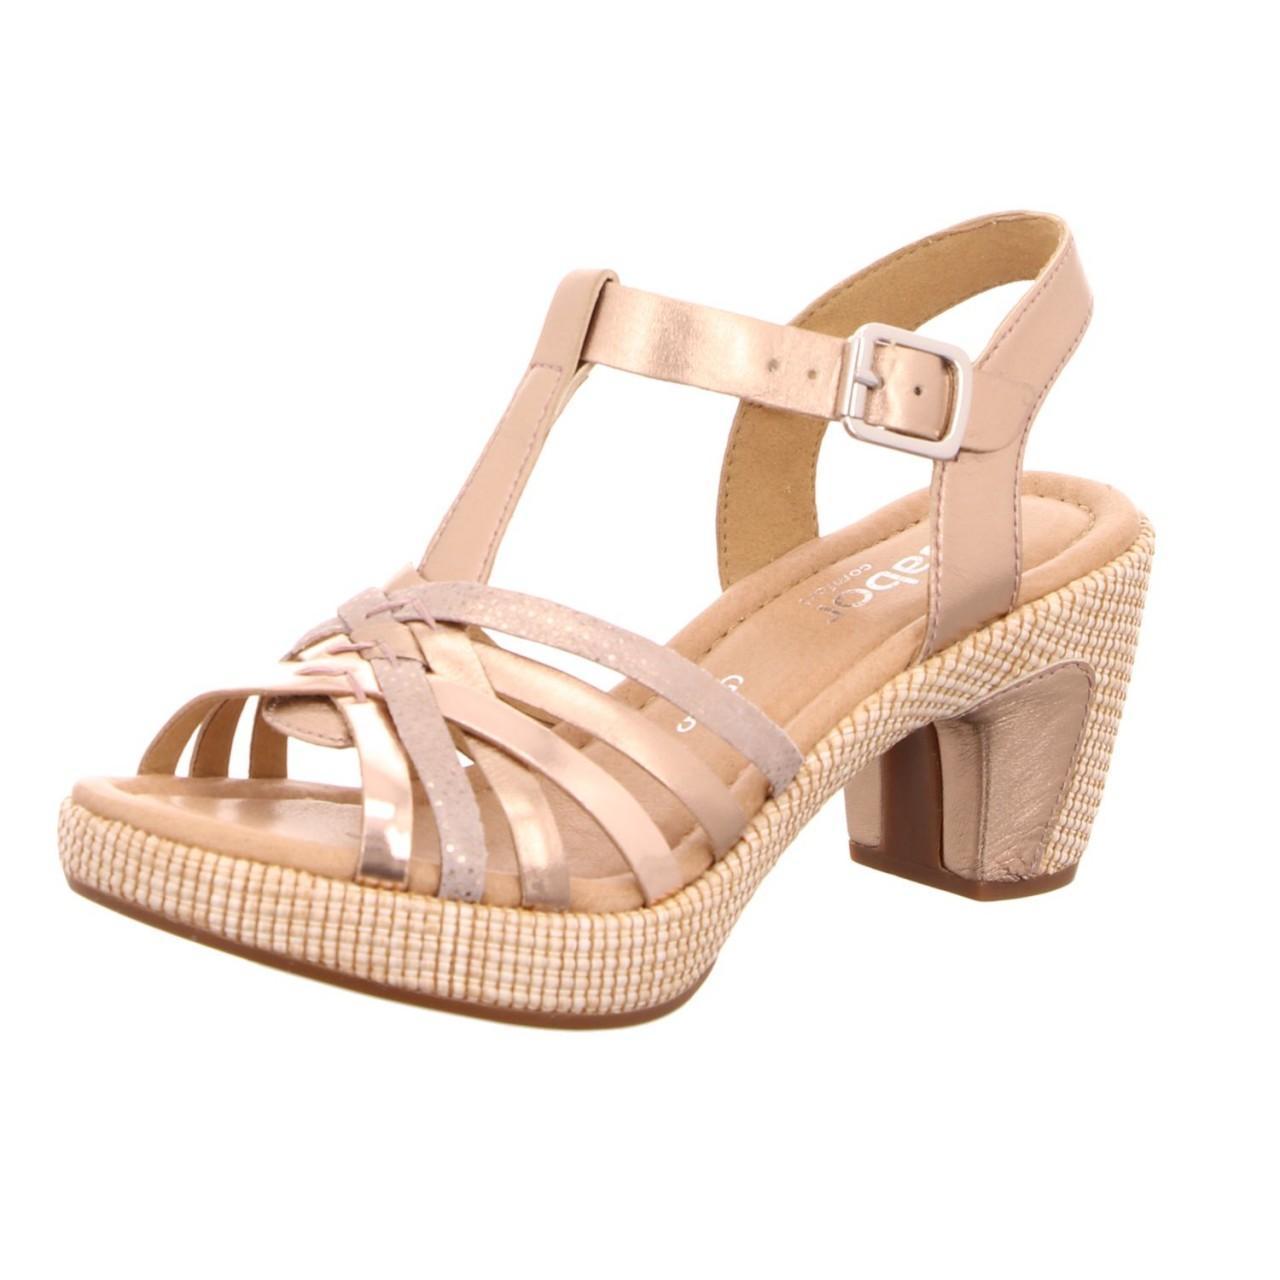 Womens Gabor 21.363 Smart Cross-Strap Heeled Shoes